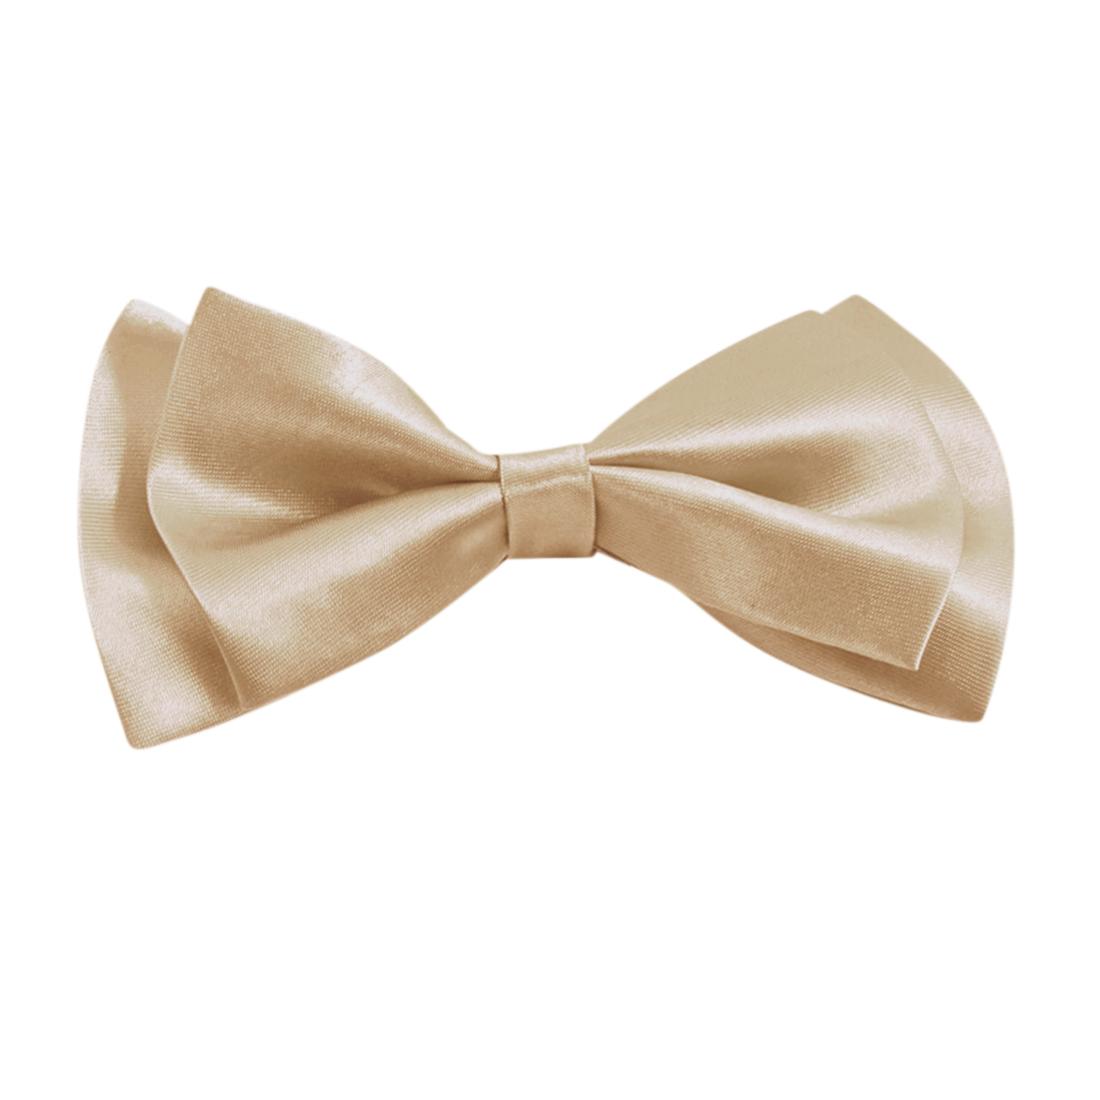 Champagne Color Adjustable Neck Strap Pre-tie Bowties Neck Decor for Men Women